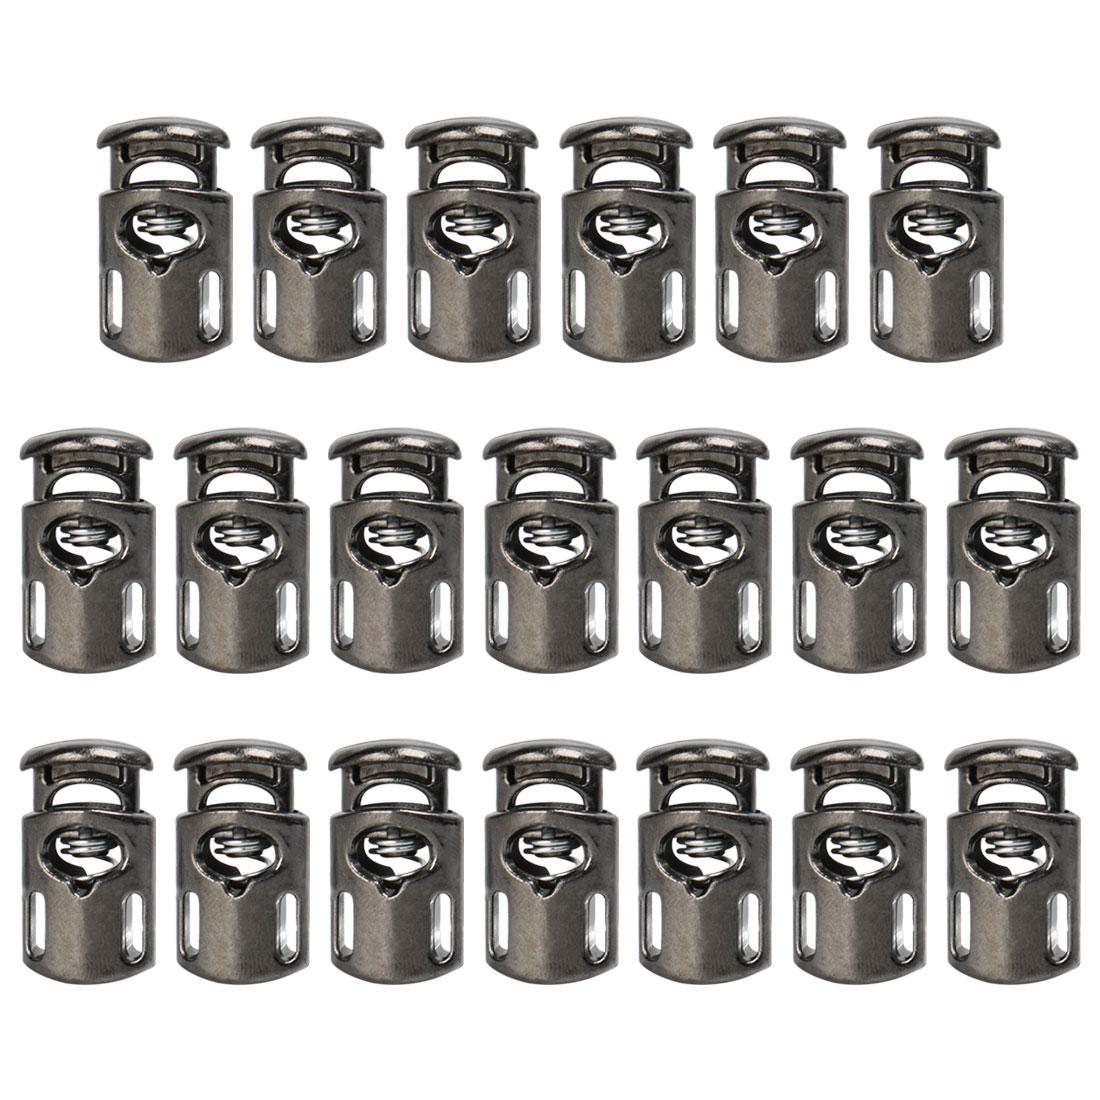 20pcs Plastic Cord Lock Stopper Spring Toggle Fastener Organizer Silver Black